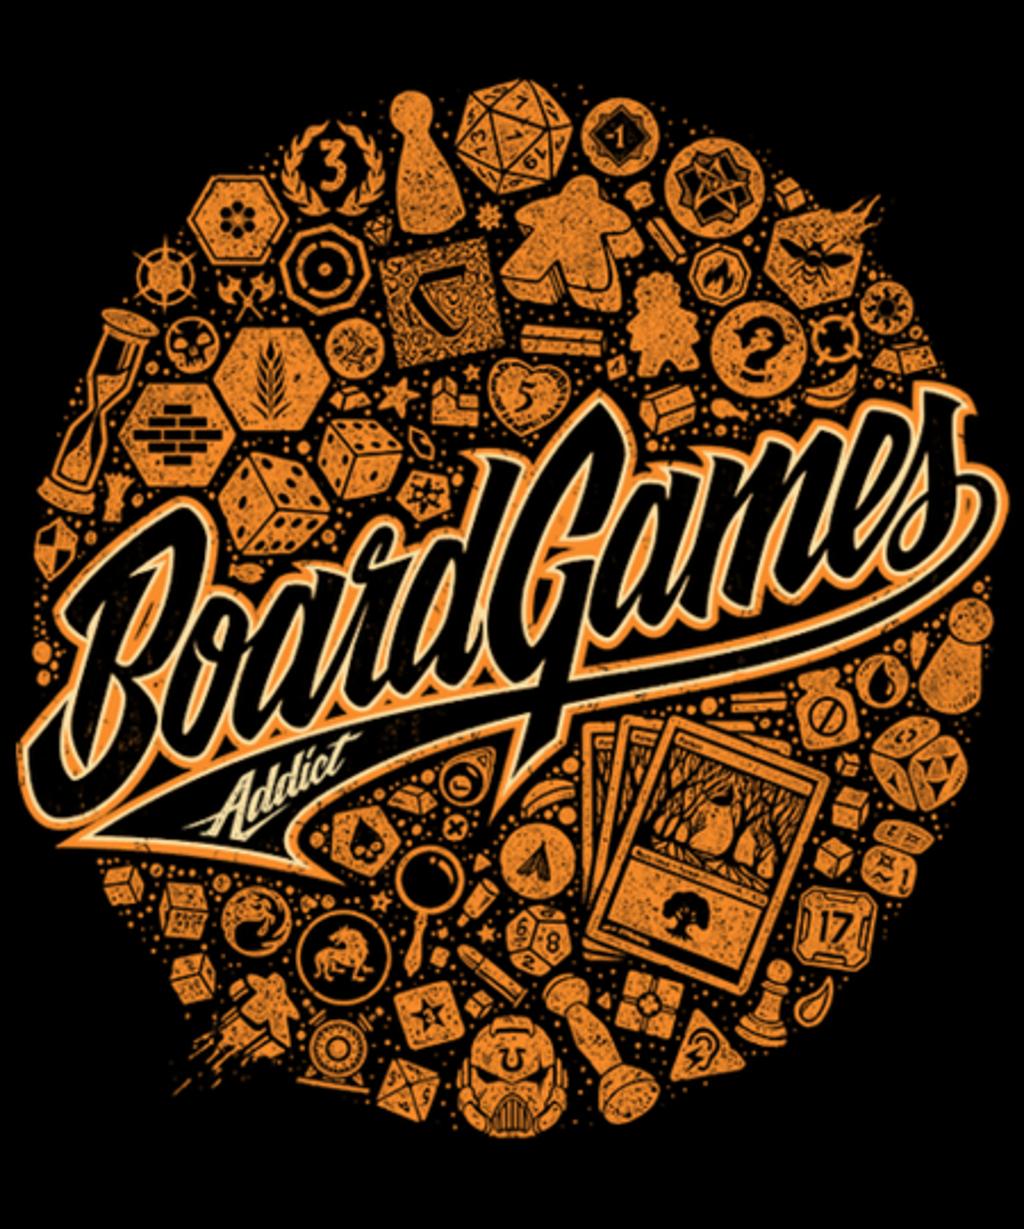 Qwertee: BoardGames Addict